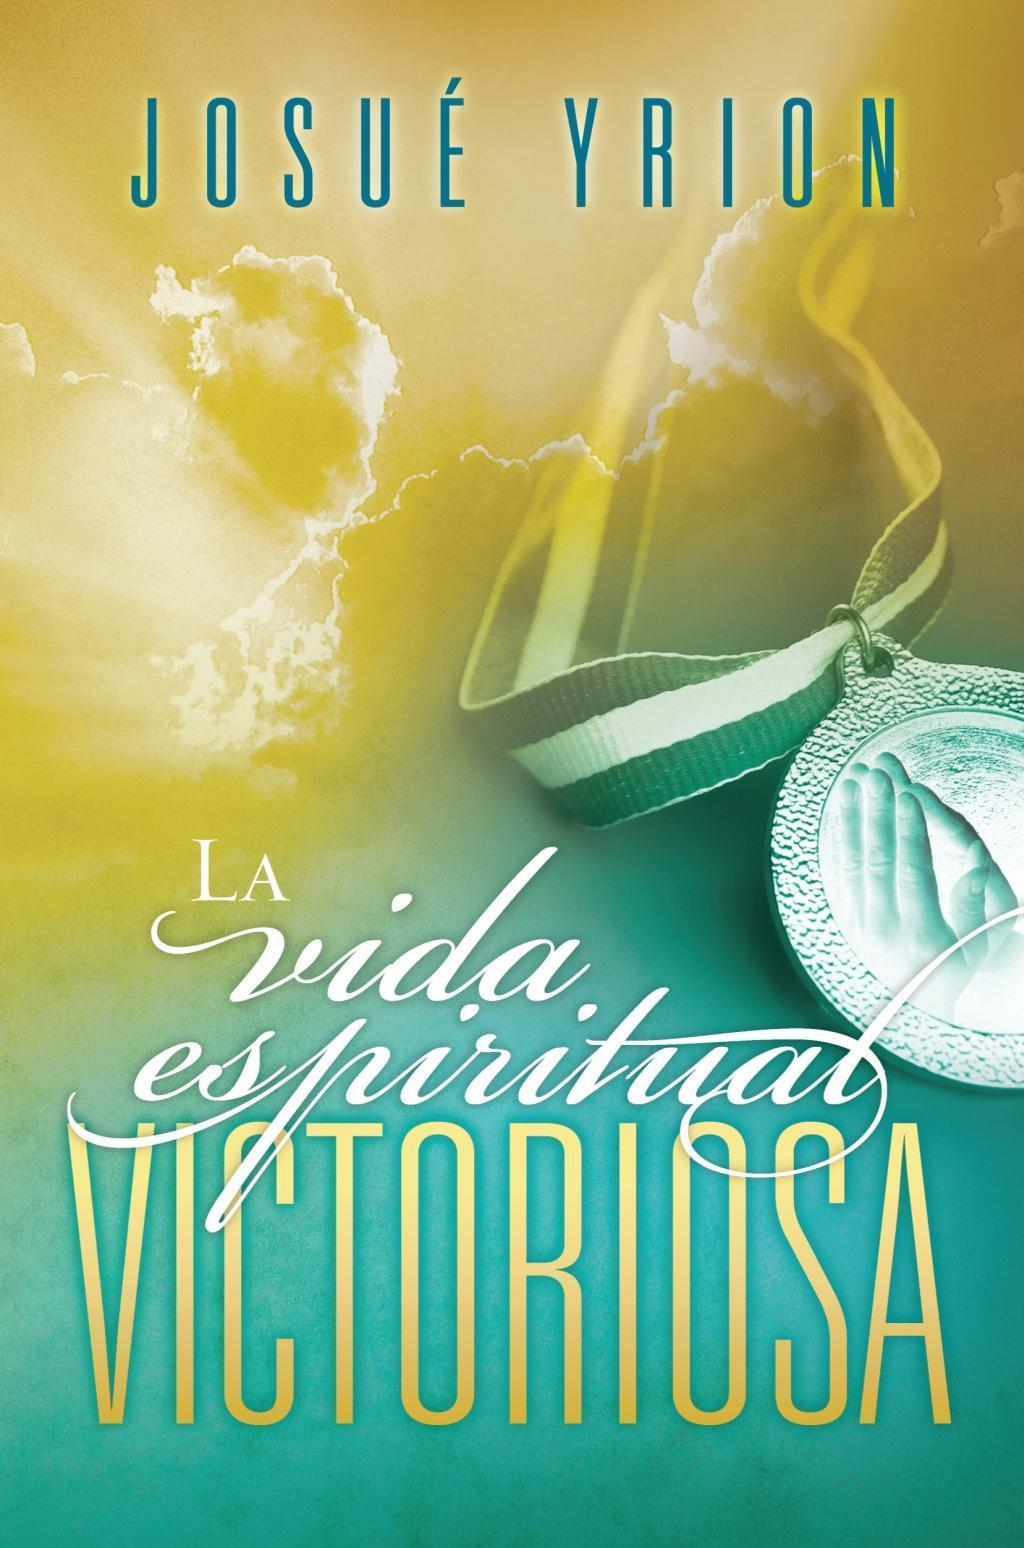 La vida espiritual victoriosa